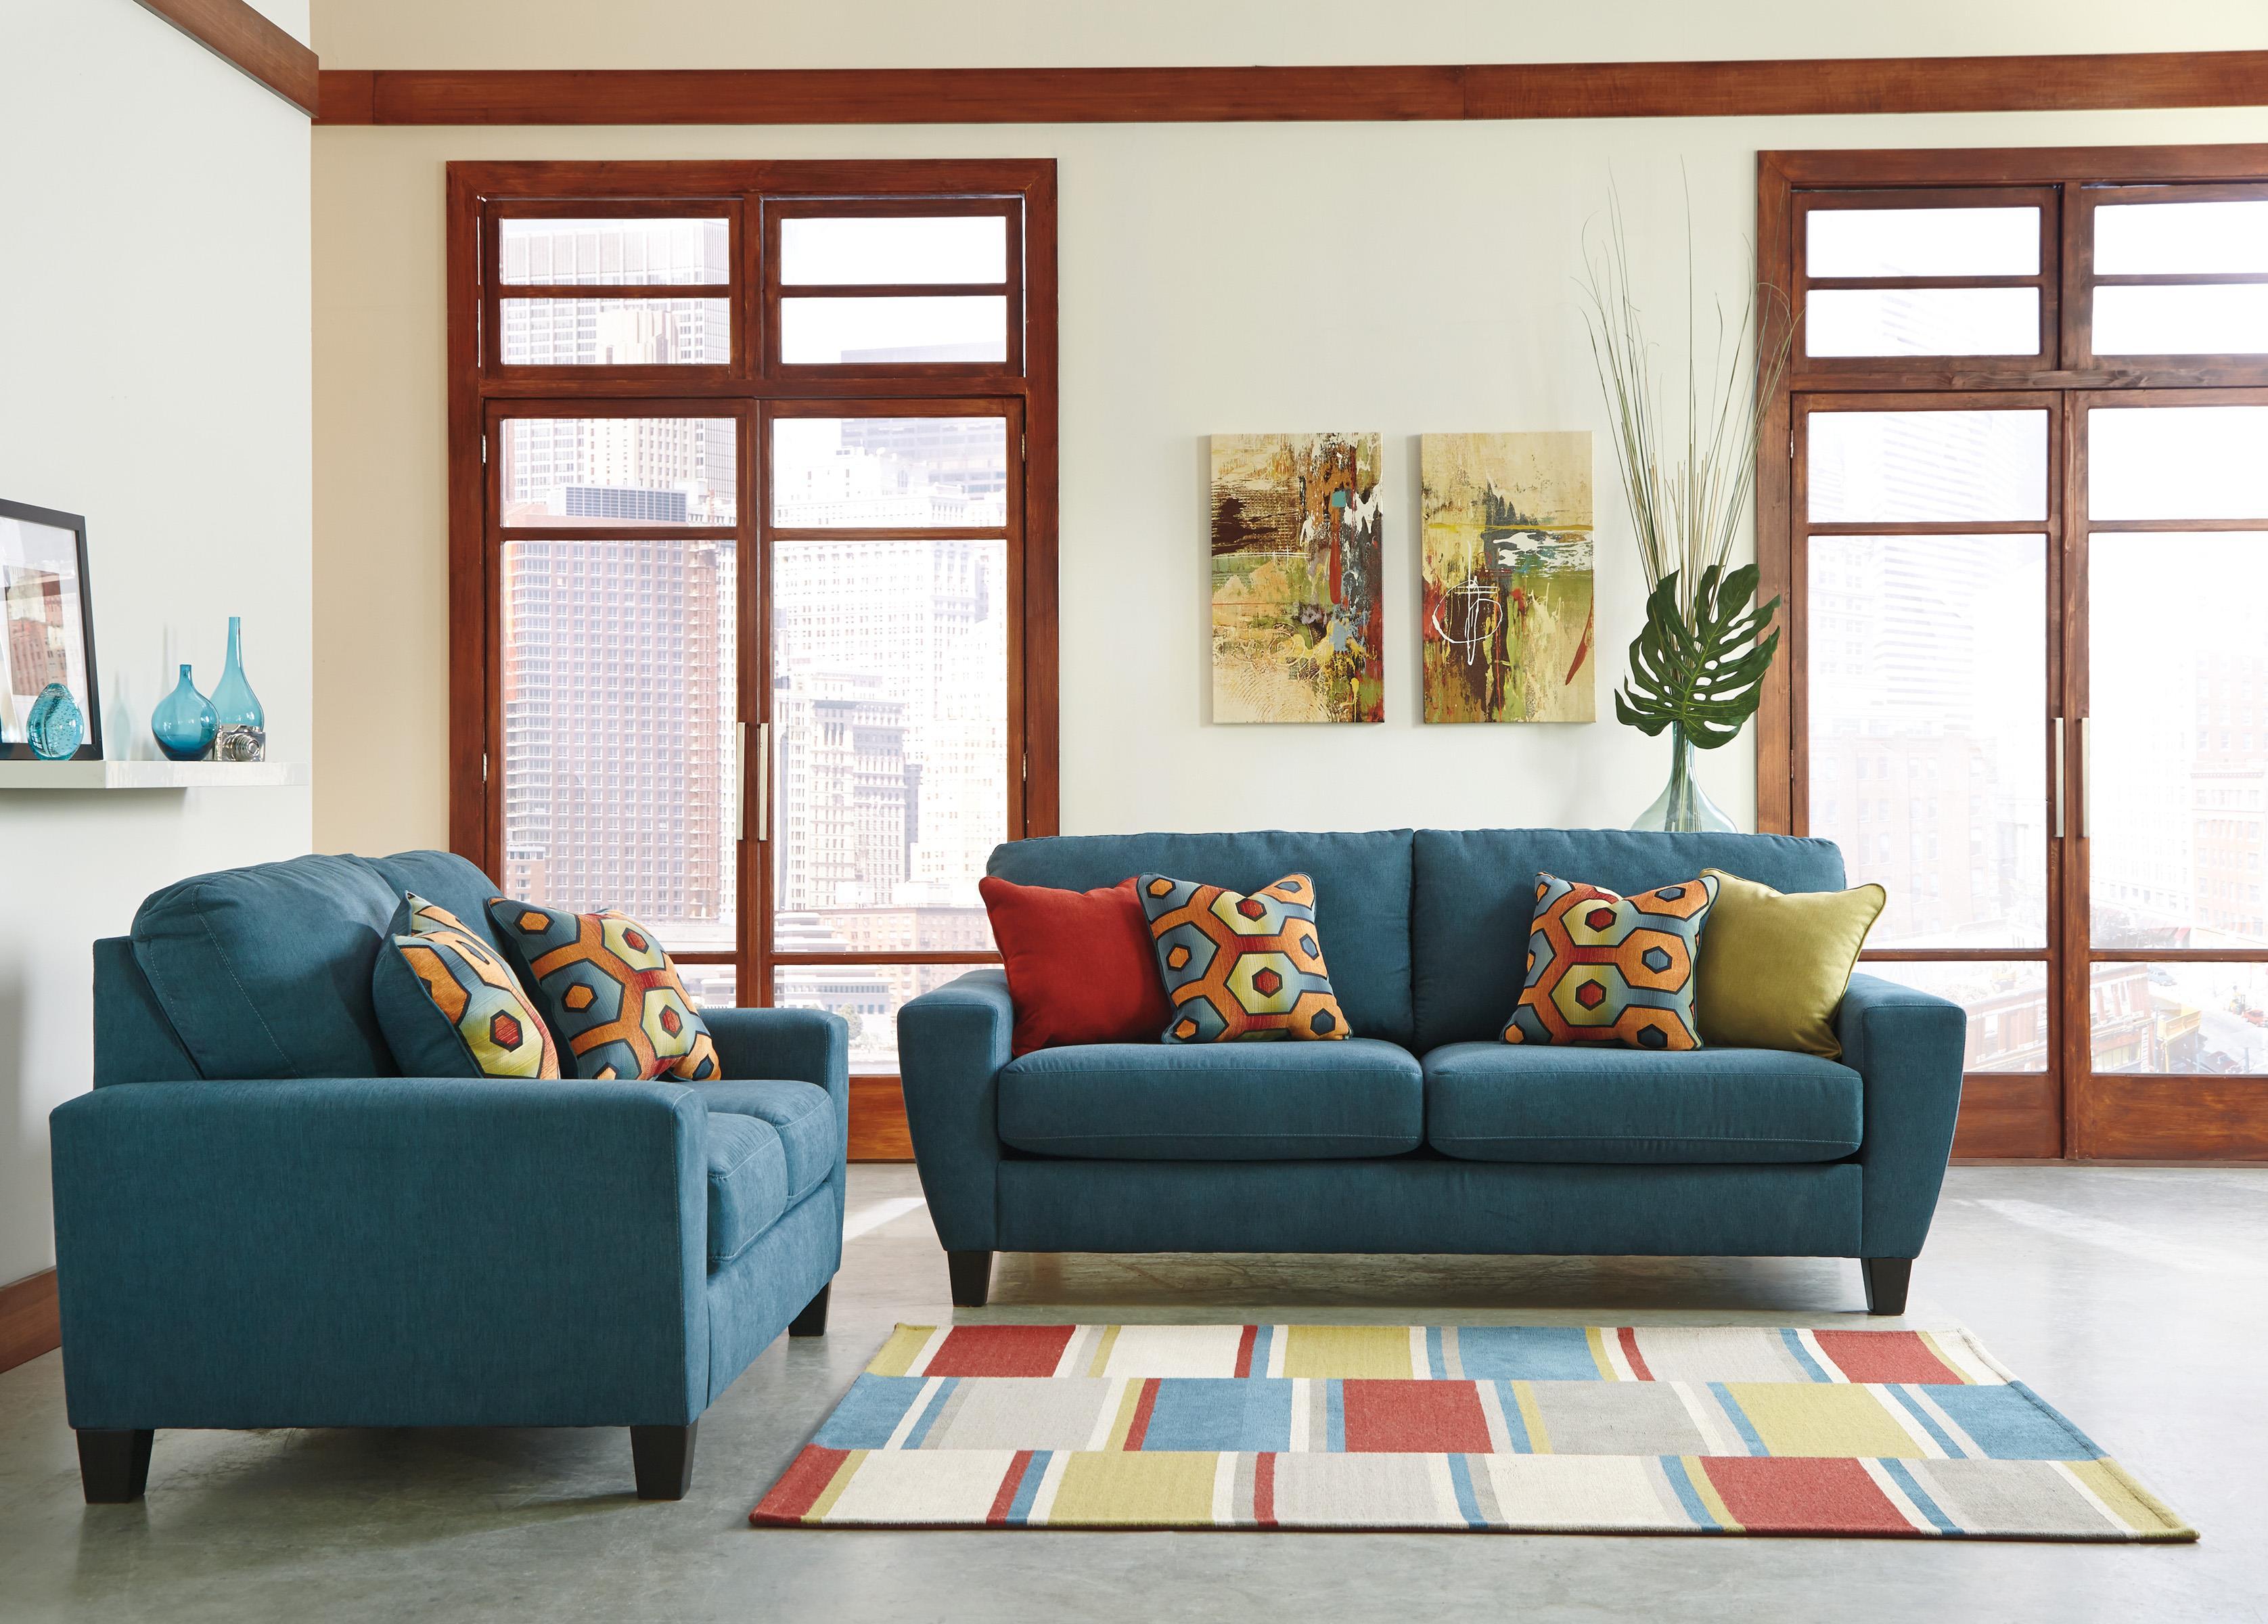 Signature Design by Ashley Sagen Stationary Living Room Group - Item Number: 93902 Living Room Group 1